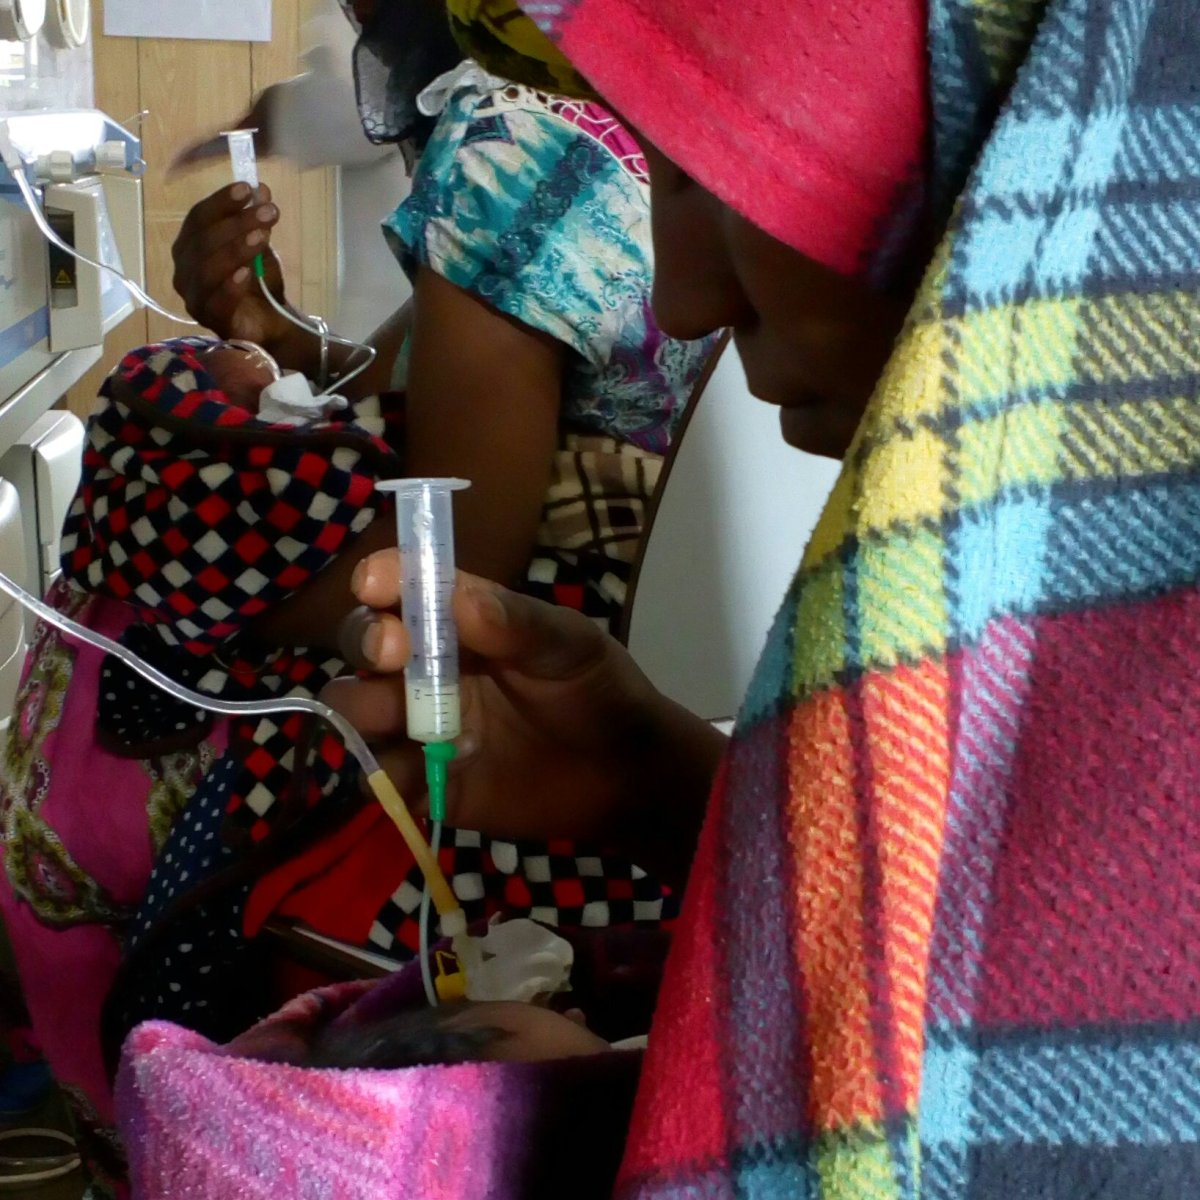 Retos desde la esperanza africa alegria gambo alegria sin fronteras dr alegria etiopia gambo